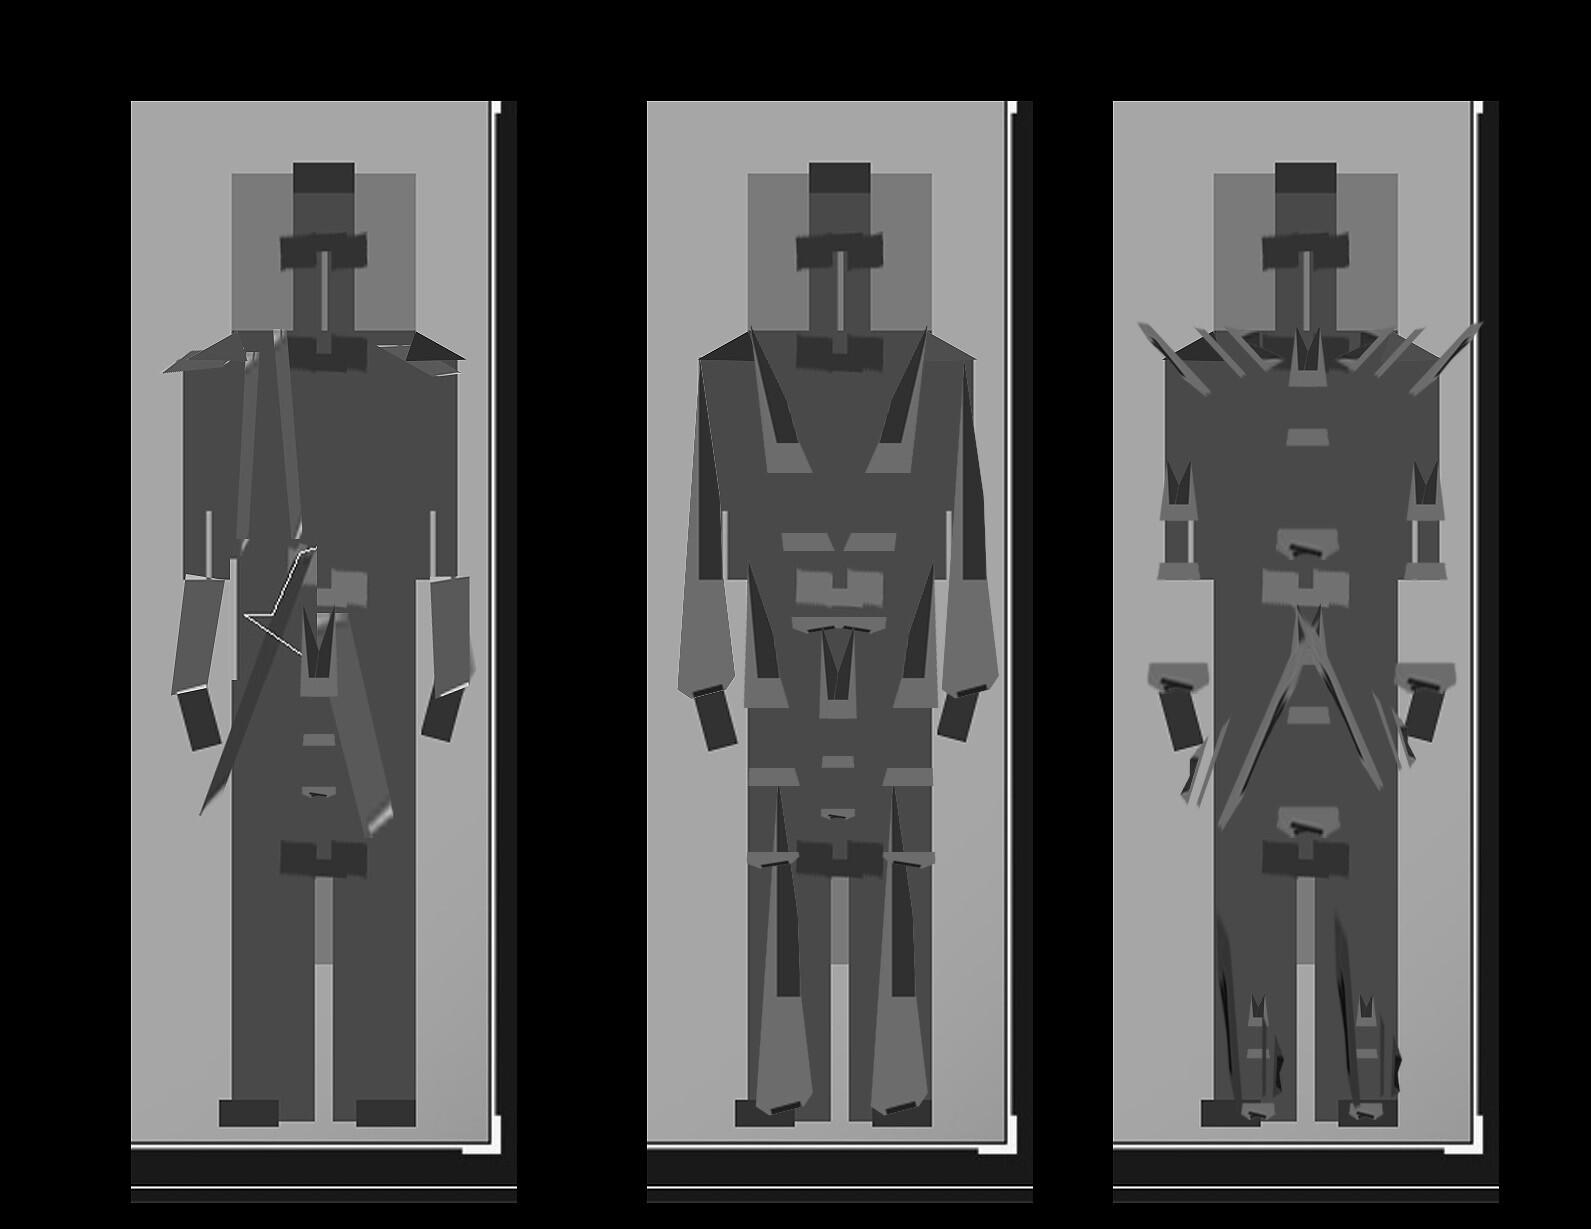 THUMB SKETCH CLOTHING DESIGN.